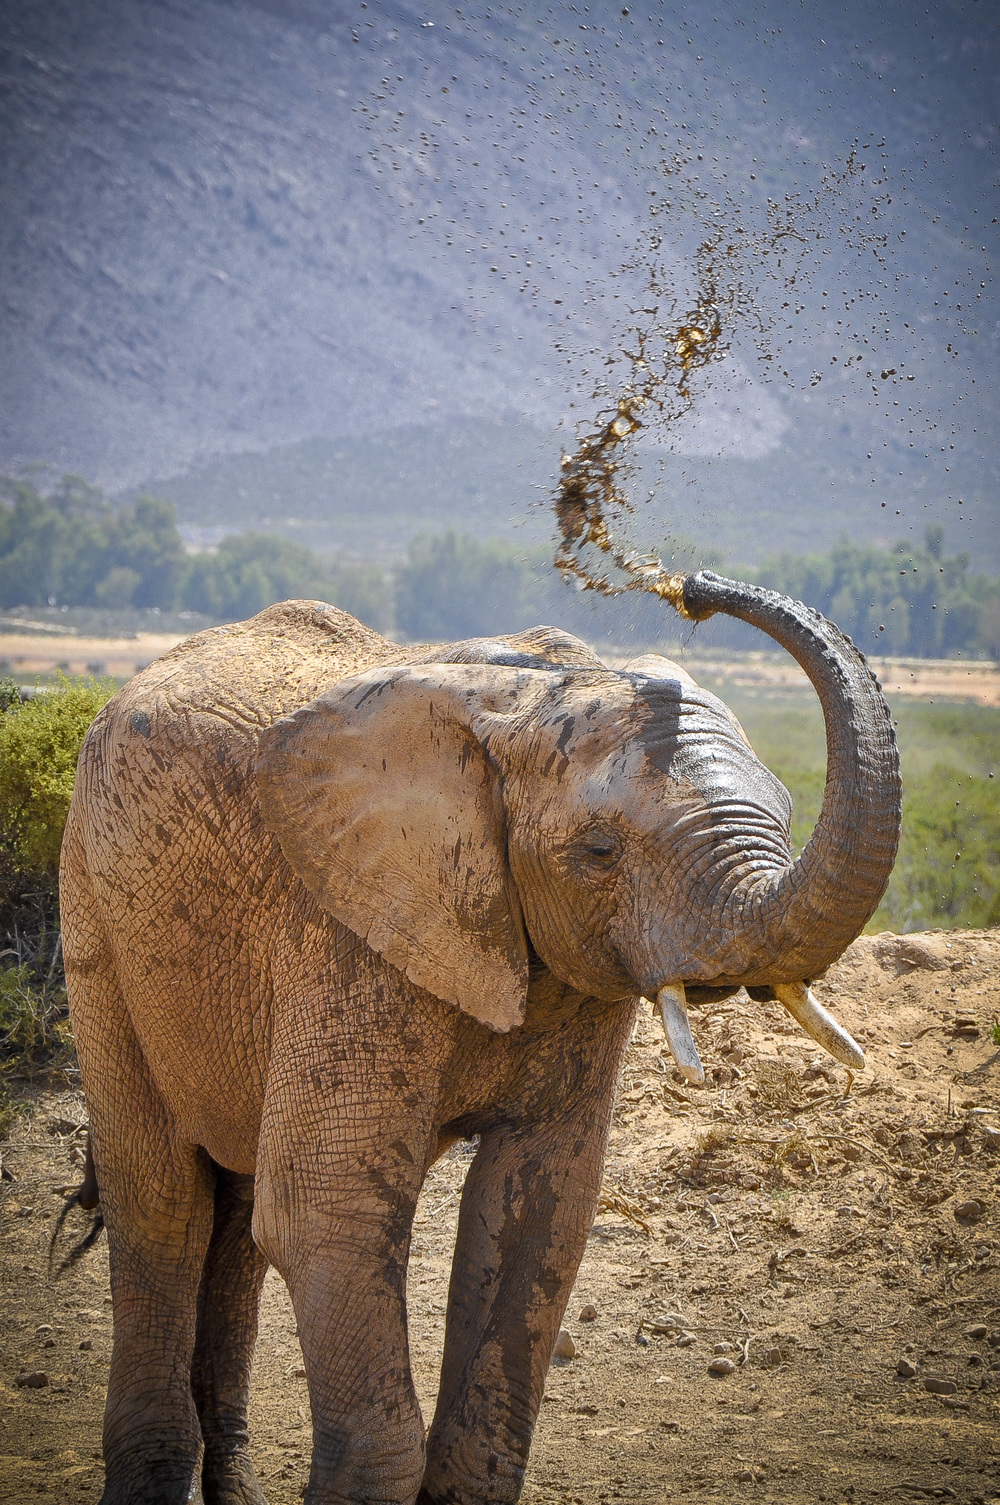 Elephant - Aquila Game Reserve